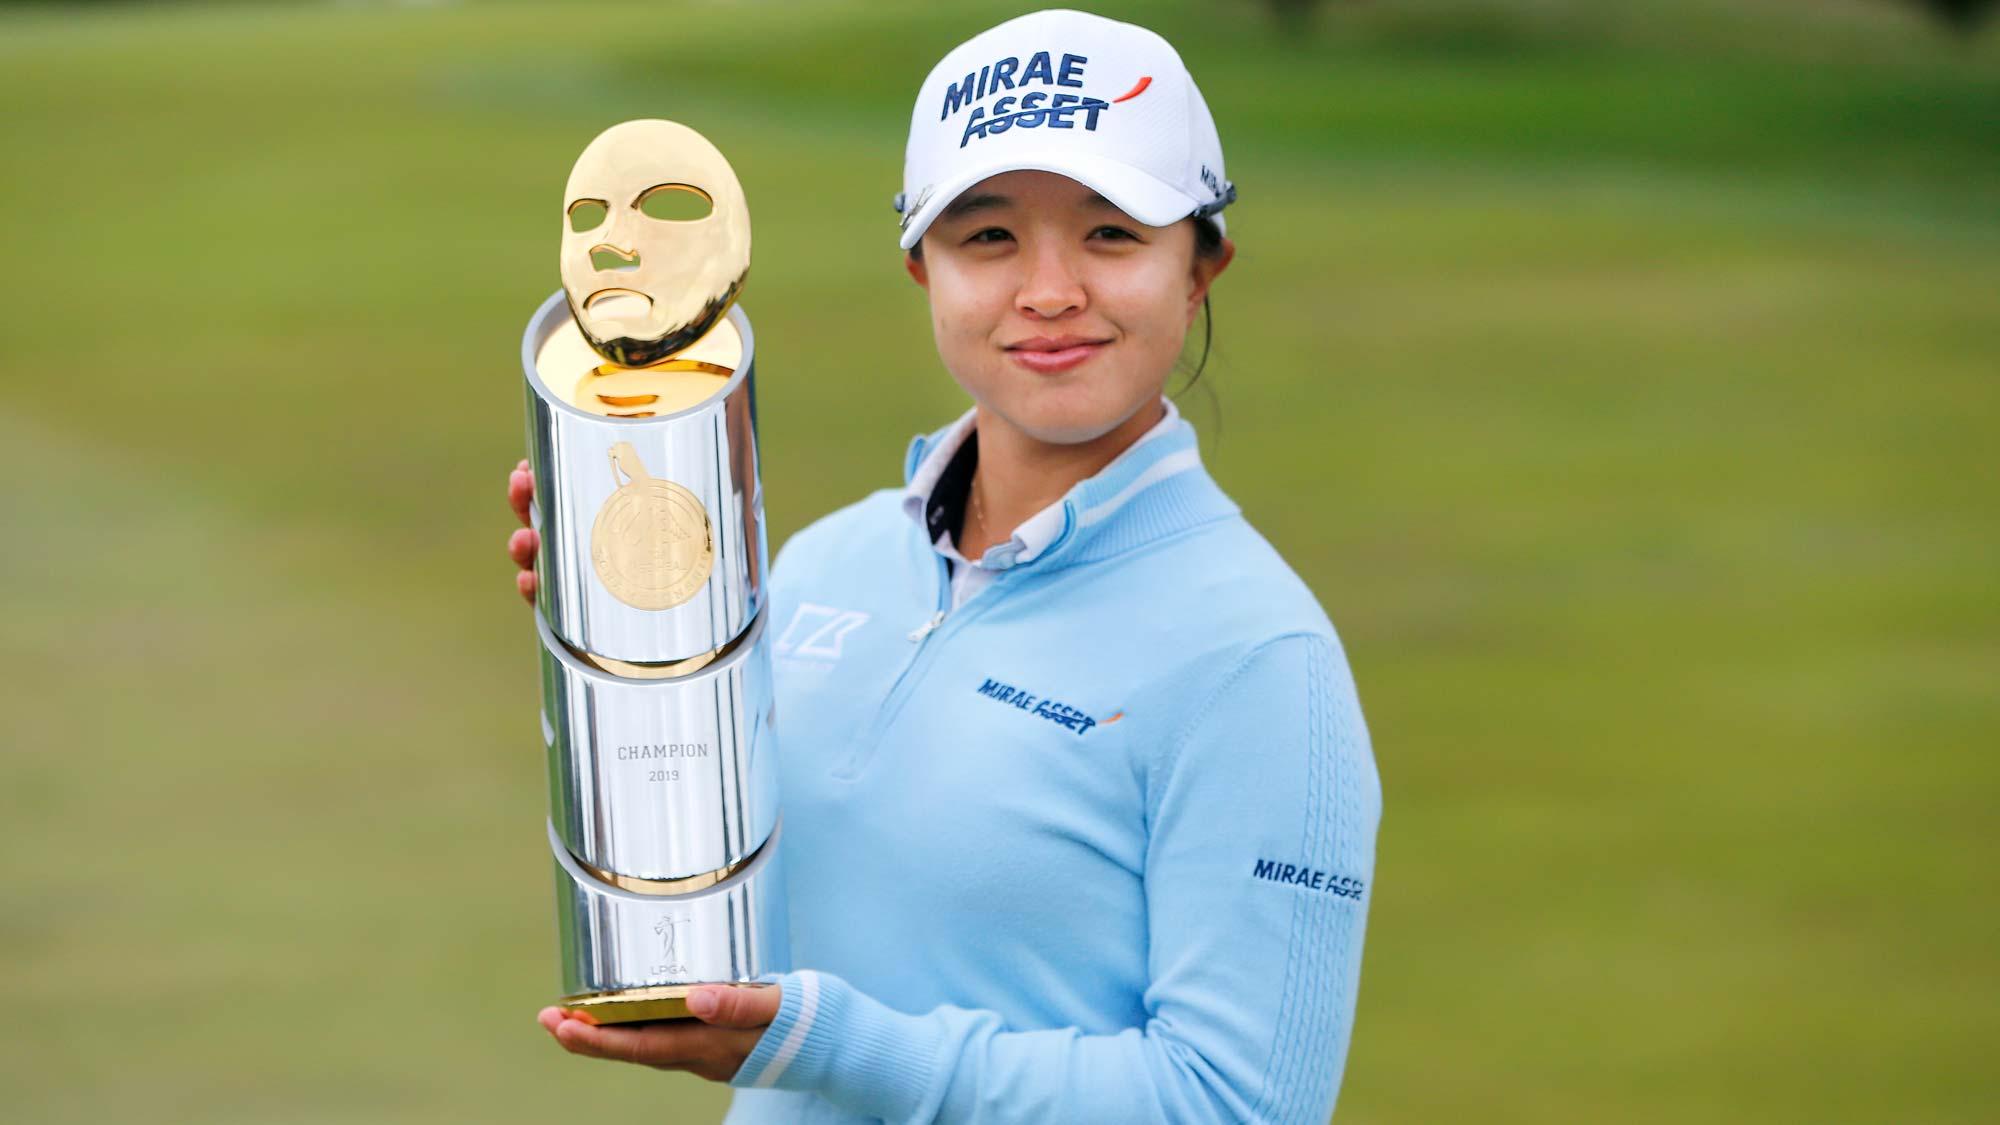 2019 defending champion Sei Young Kim